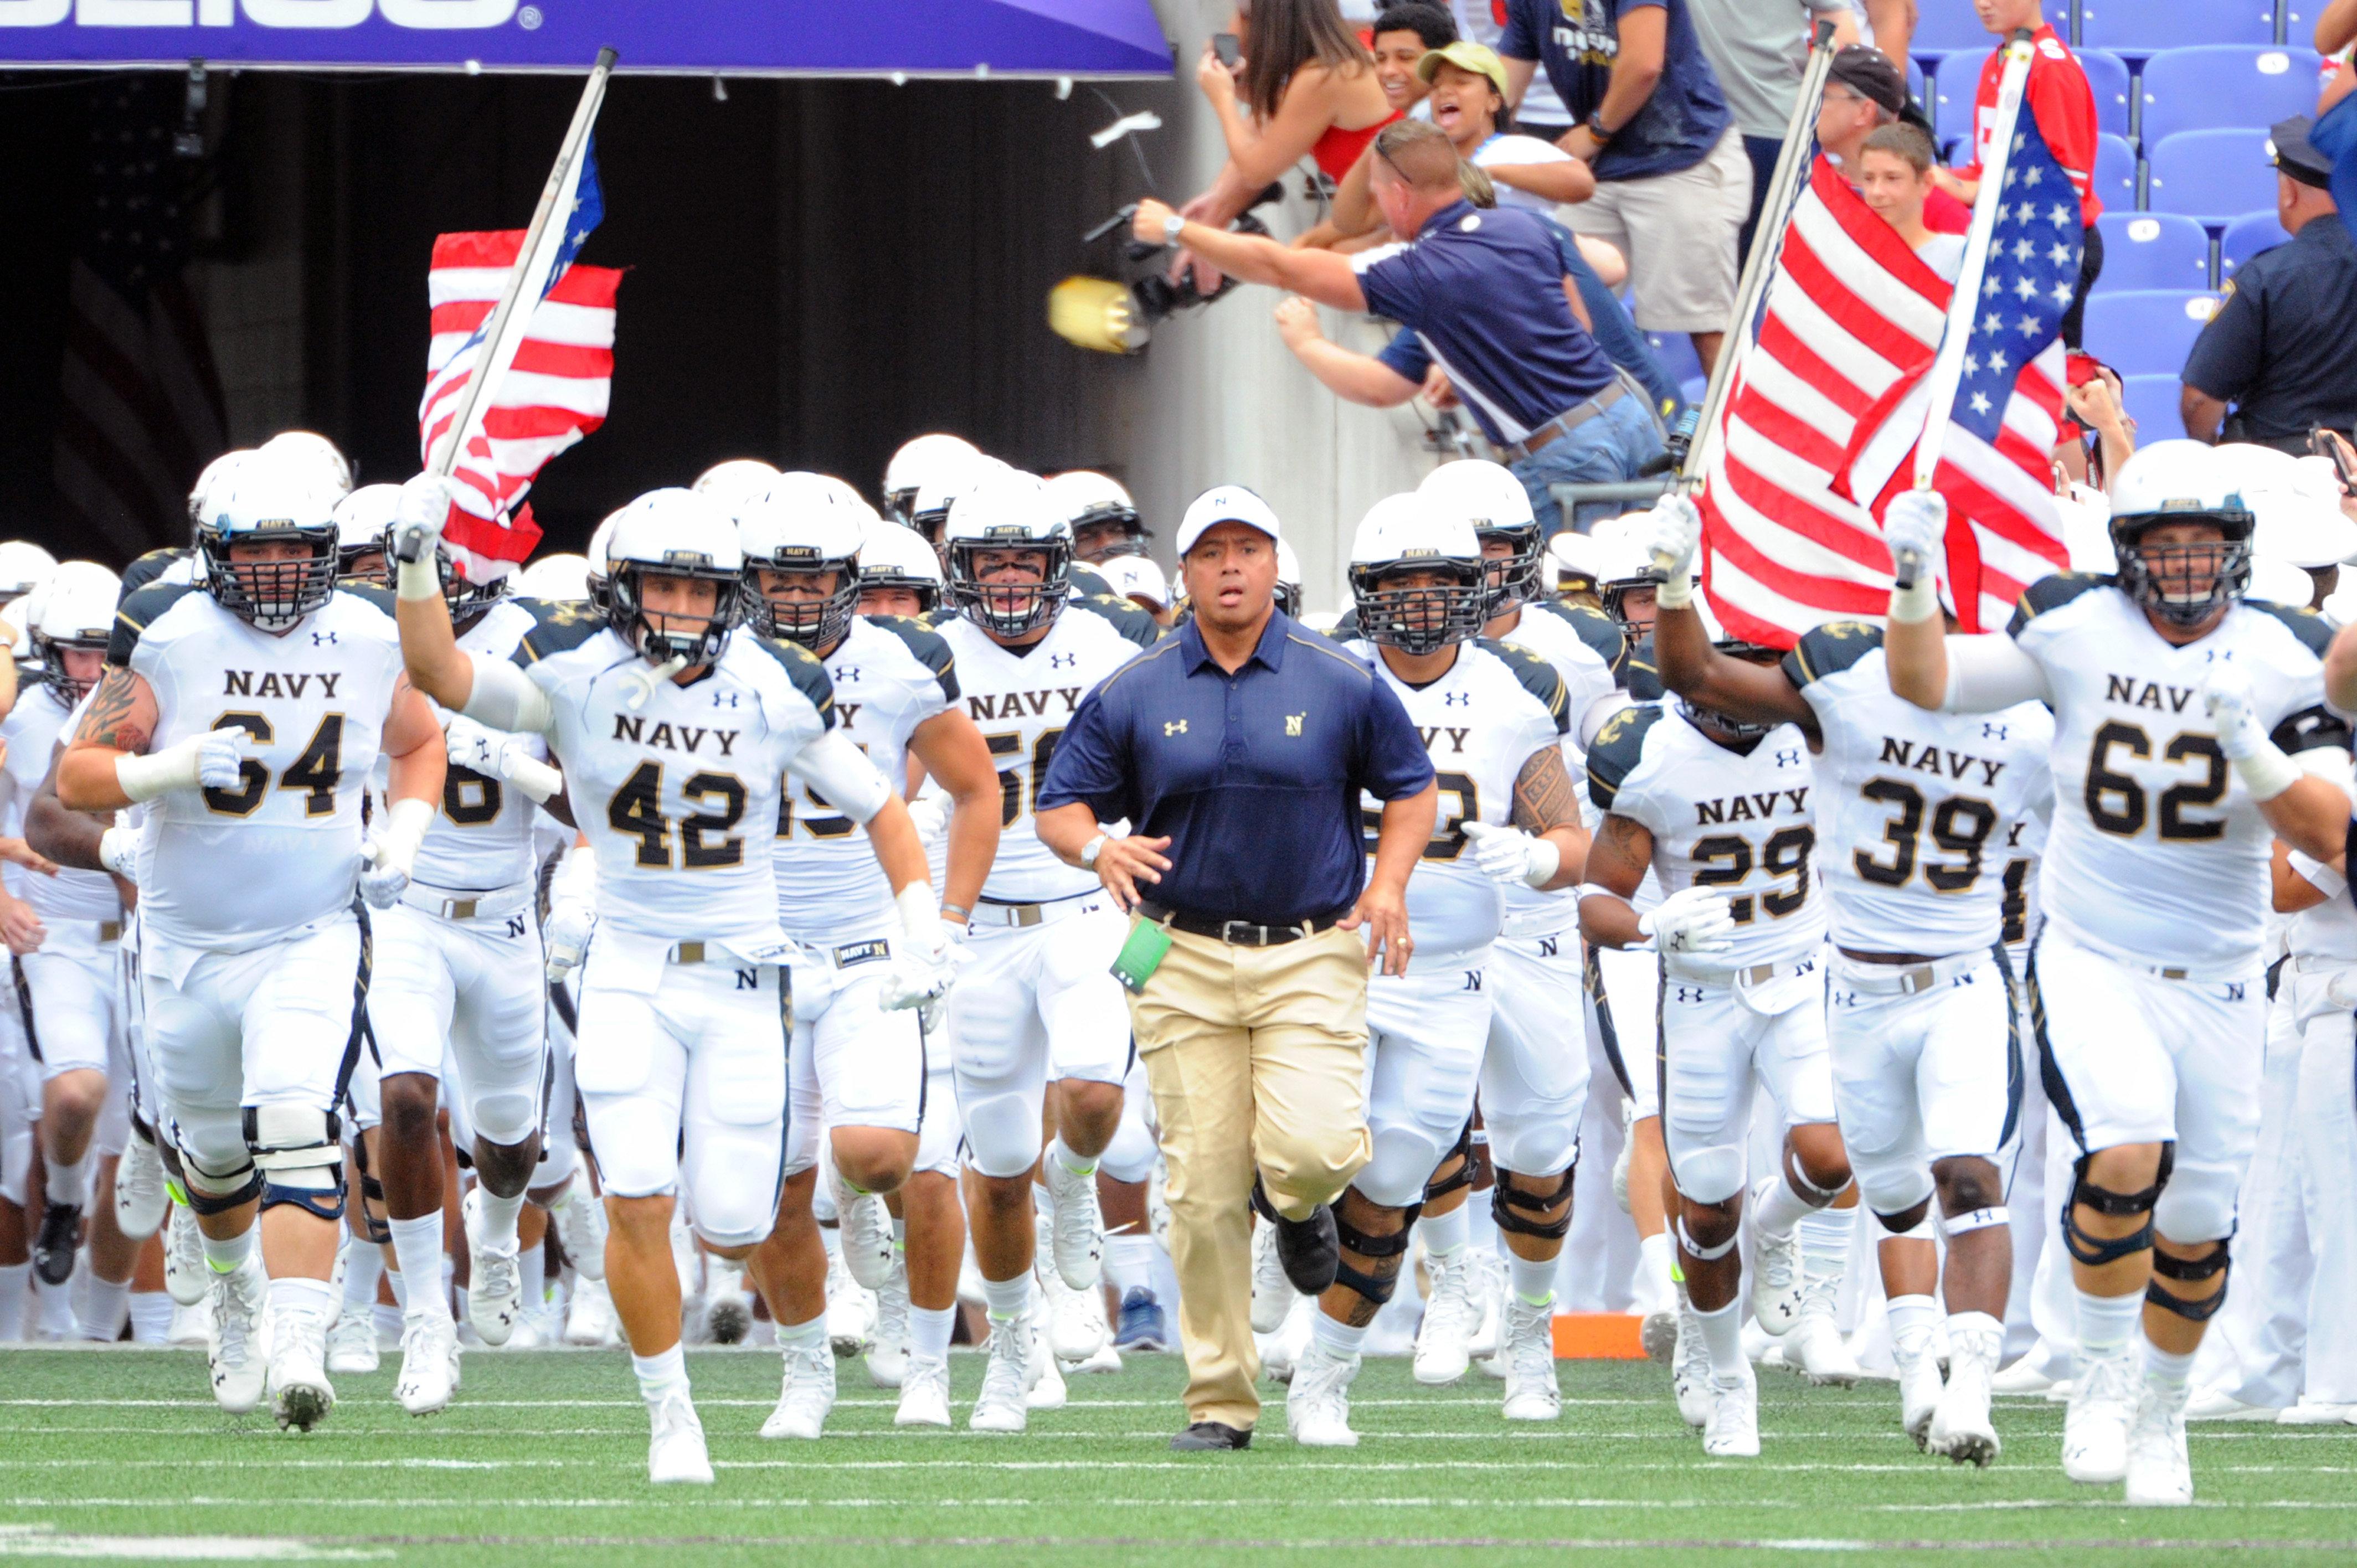 NCAA FOOTBALL: AUG 30 Ohio State at Navy